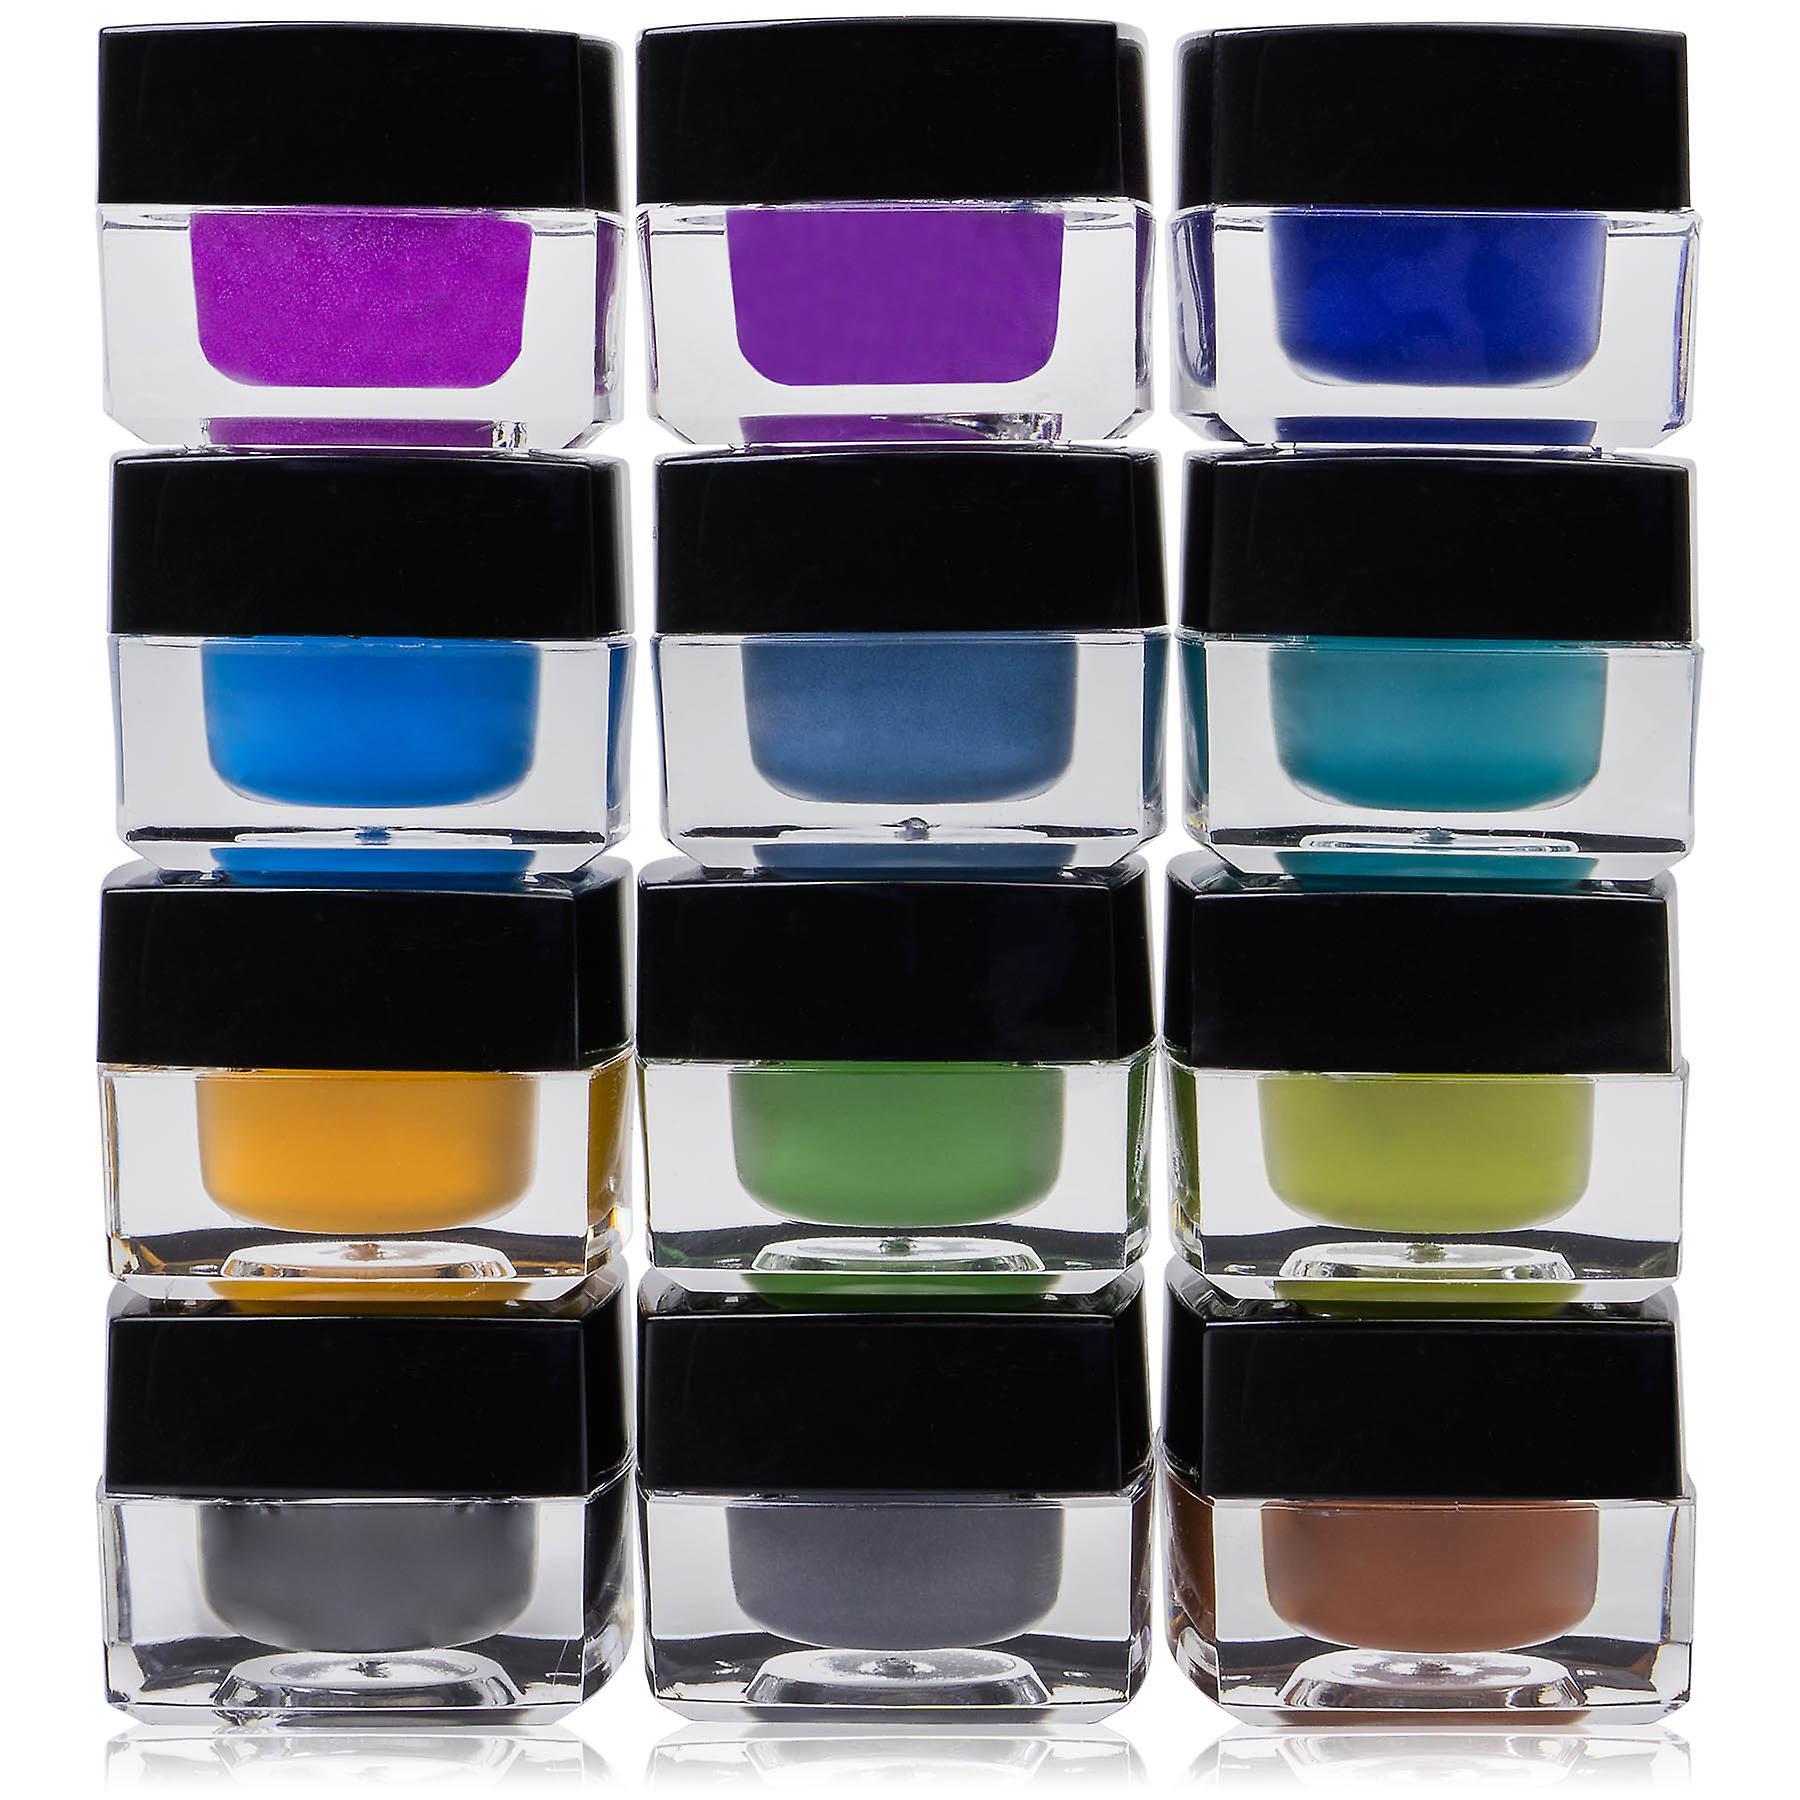 SHANY Smudge Proof Gel Eyeliner Set - Set of 12 Colors - Masquerade